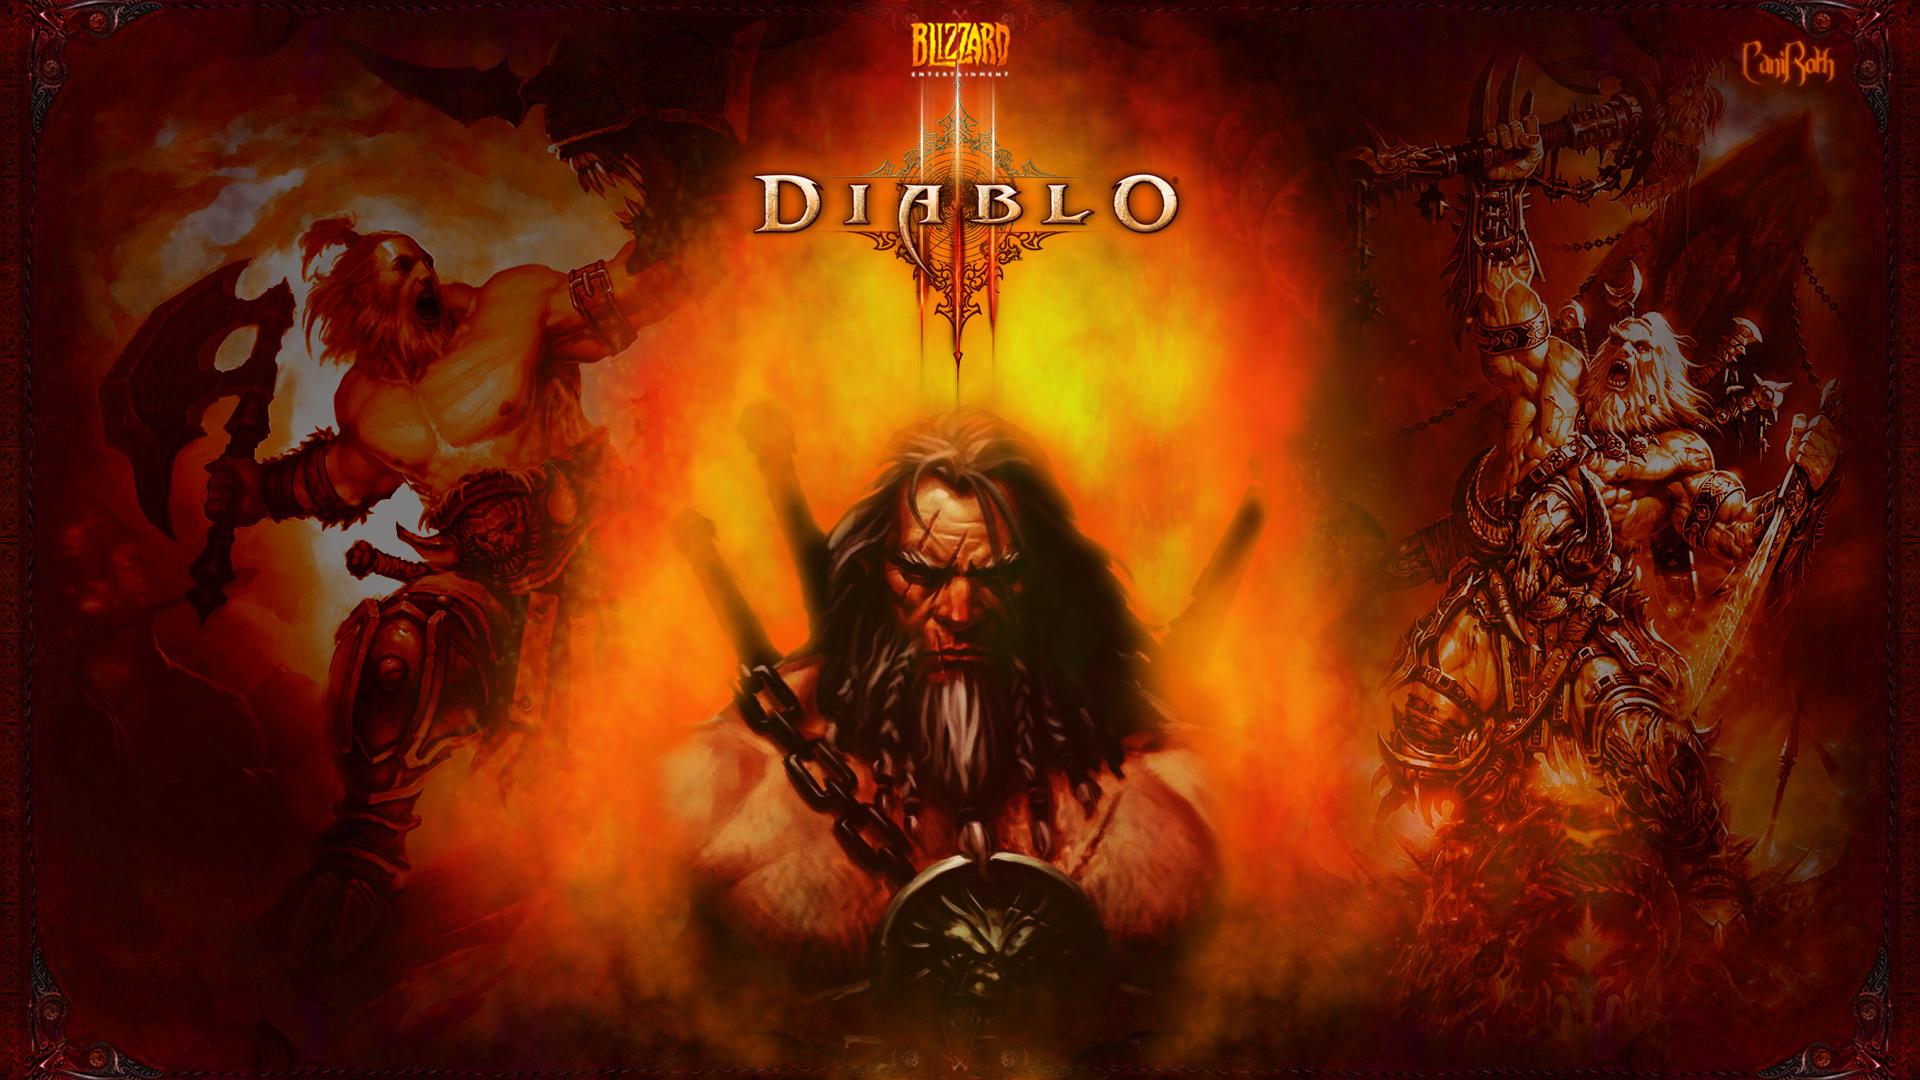 Fiery Barbarian Wallpaper Diablo 3 and Diablo Forums   Diablo 1920x1080